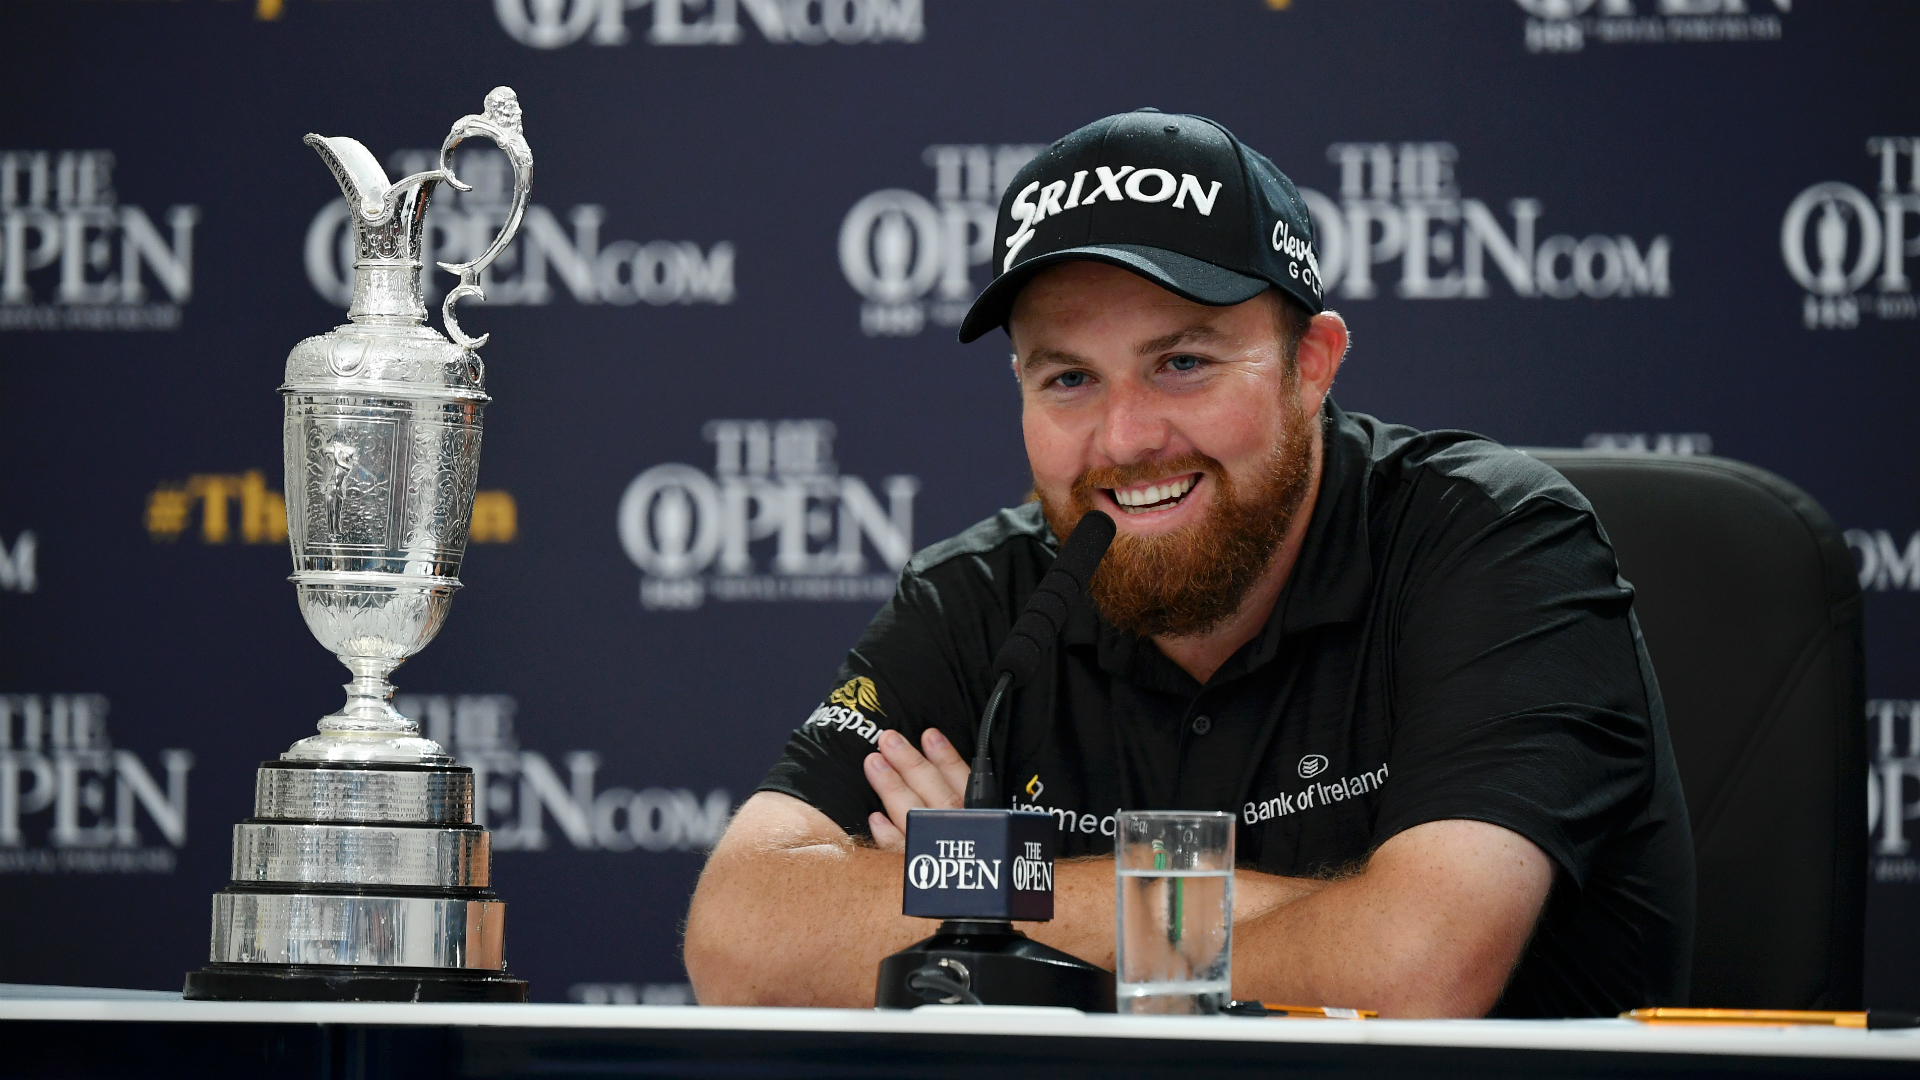 British Open 2019: Shane Lowry reflects on stunning turnaround to victory